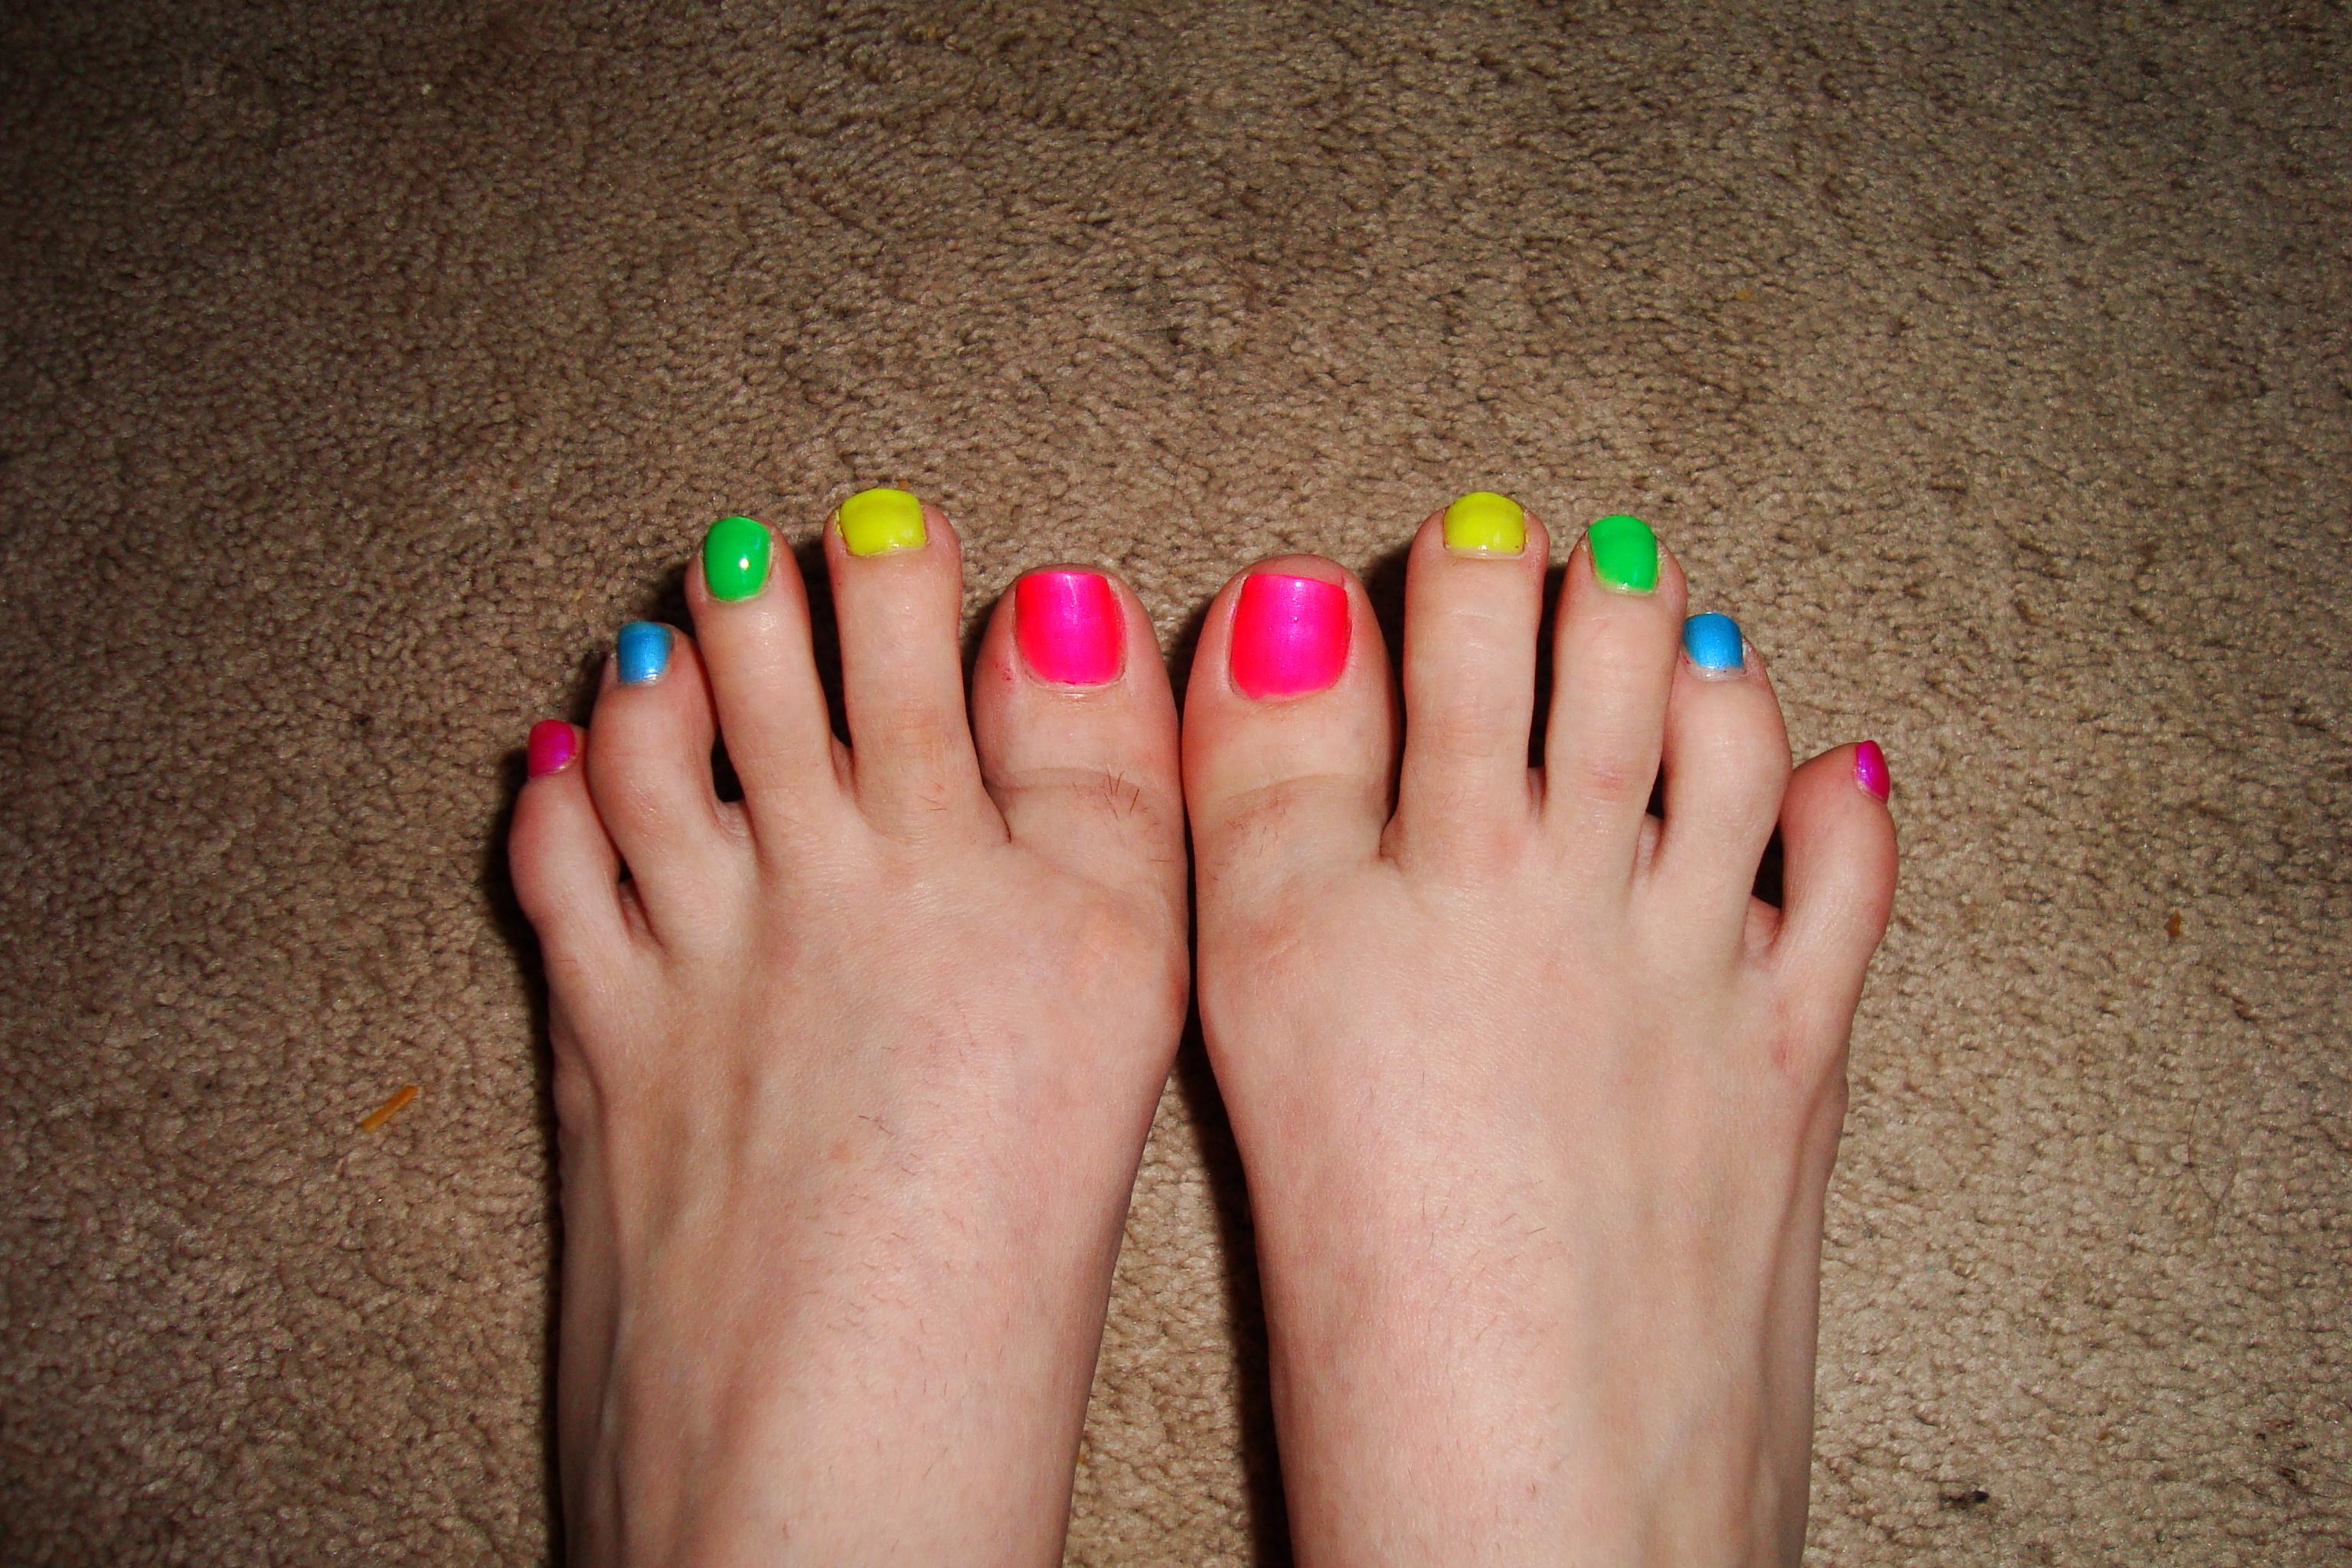 Toe Nail Designs Rainbow: Rainbow zebra toe nail art design tutorial.